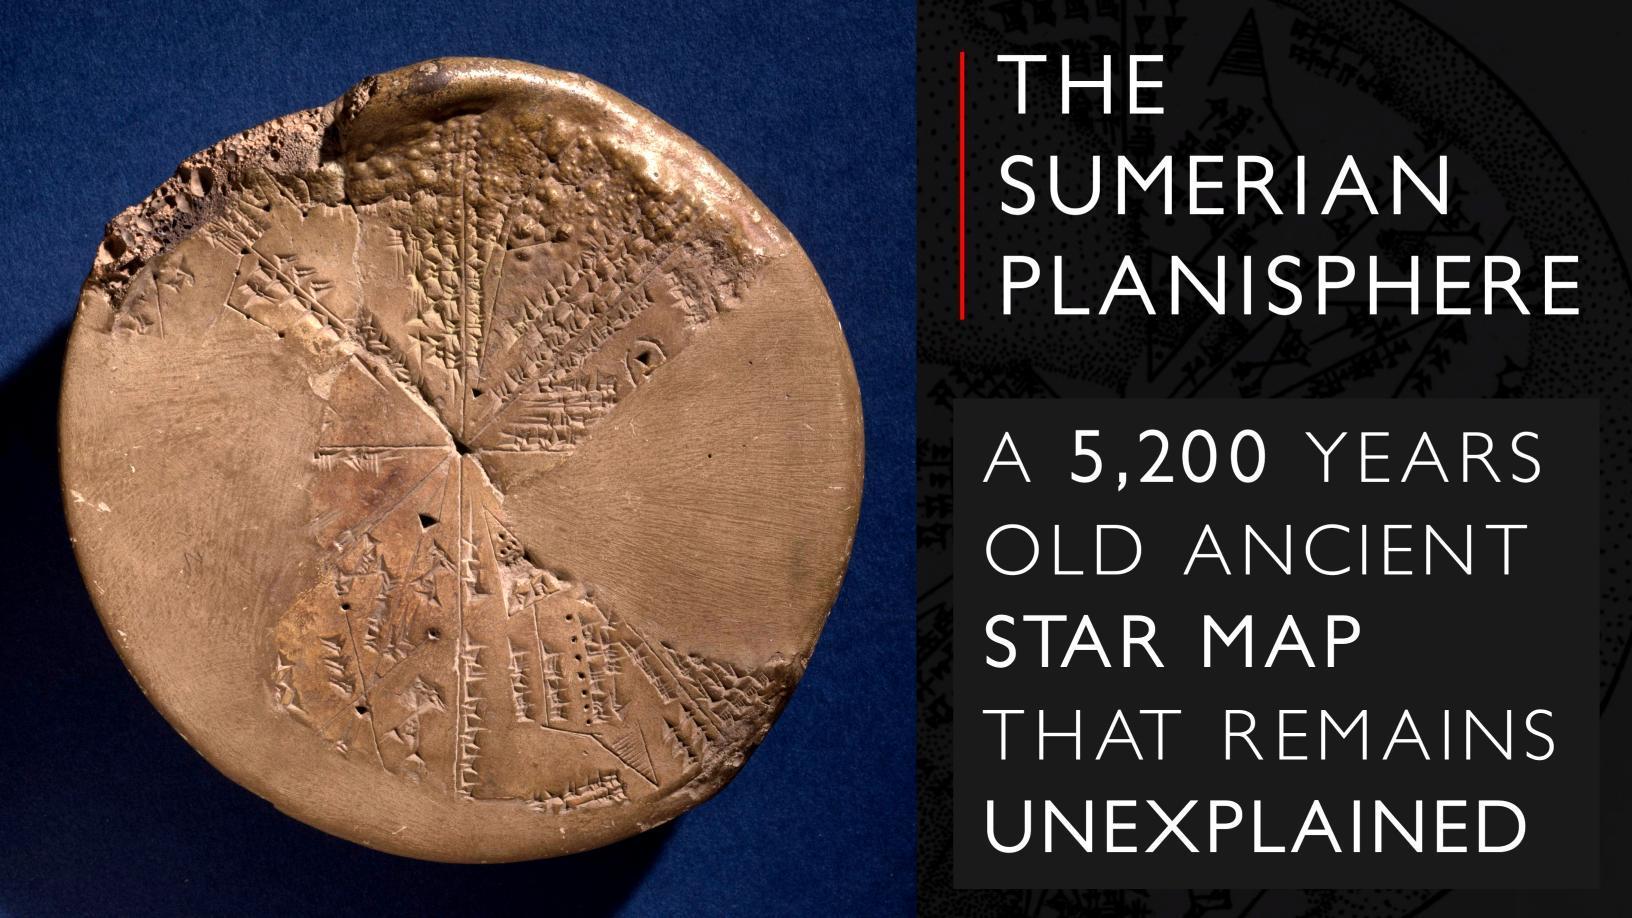 The Sumerian Planisphere